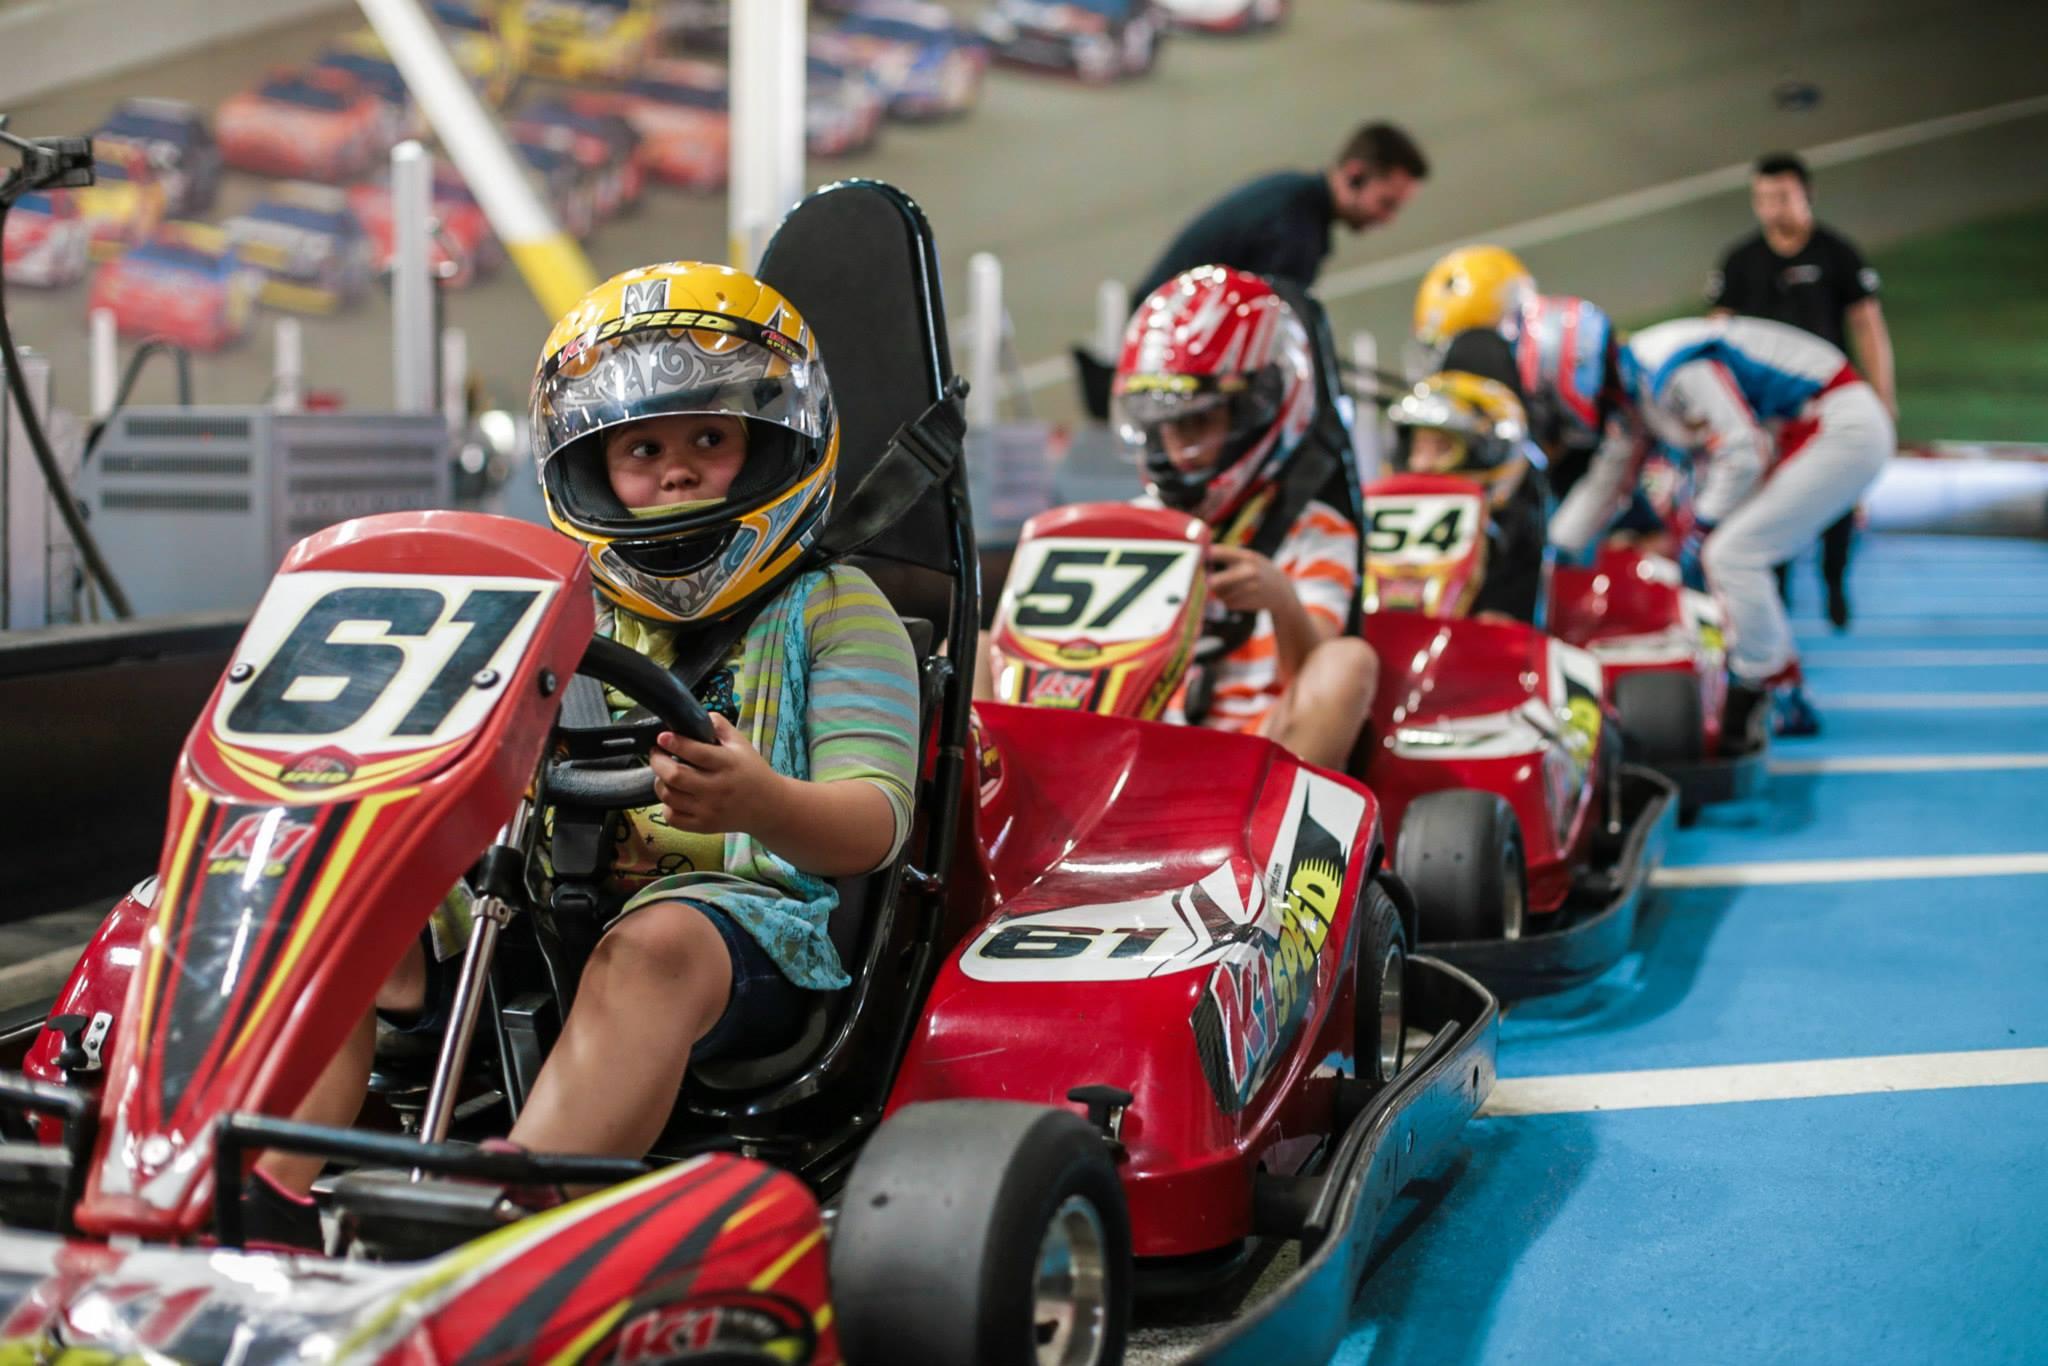 Junior Mini Grand Prix Birthday Party - Torrance - Image 1